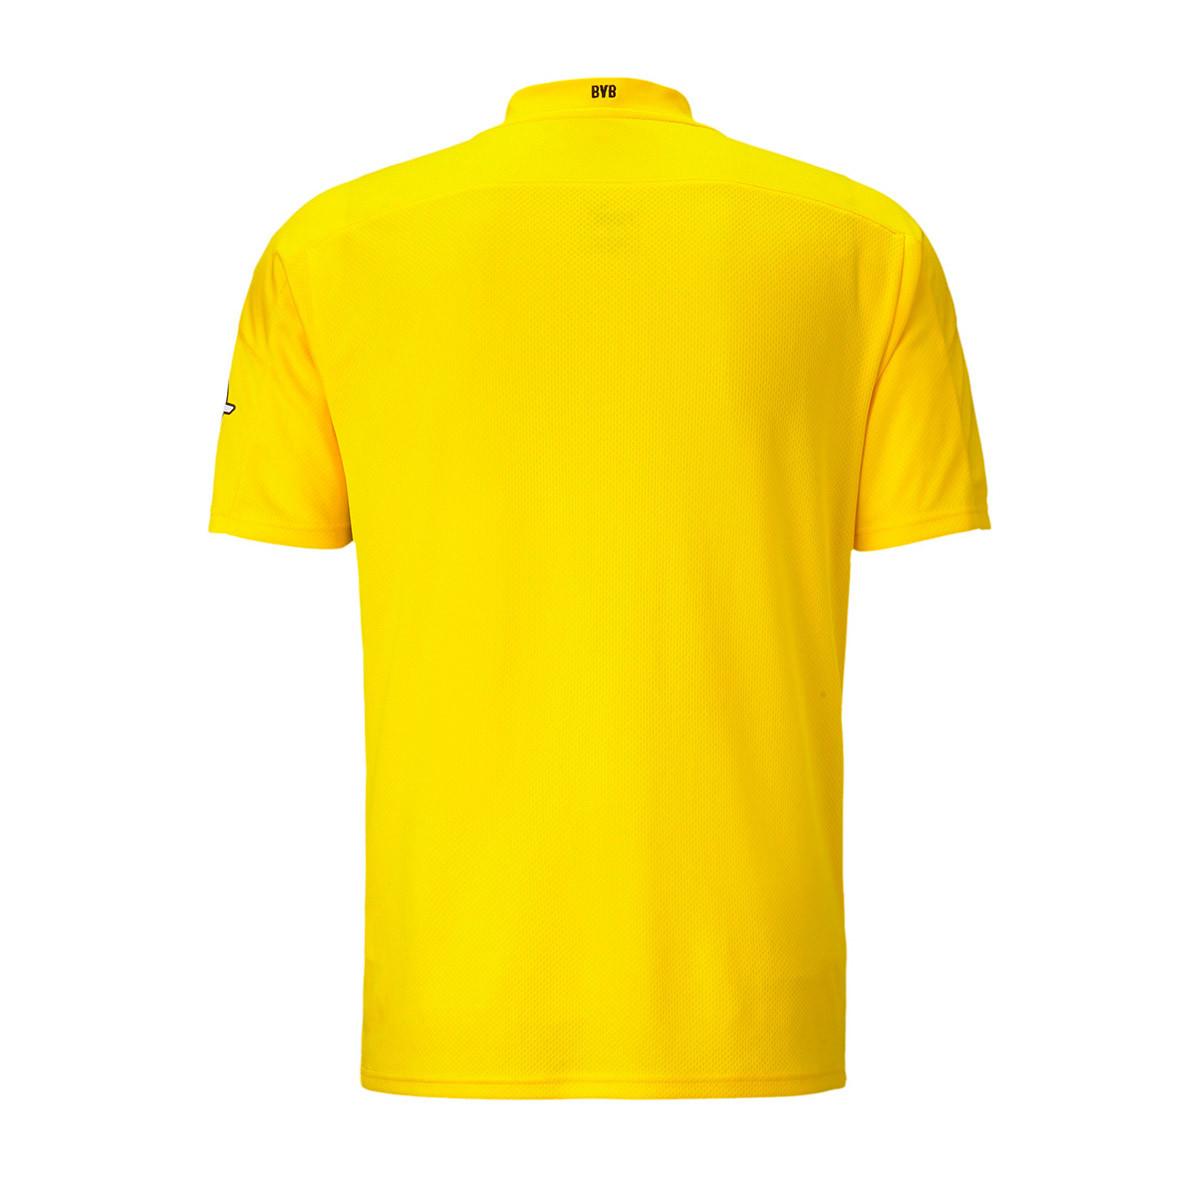 Jersey Puma Bvb Borussia Dortmund 2020 2021 Home Cyber Yellow Puma Black Football Store Futbol Emotion